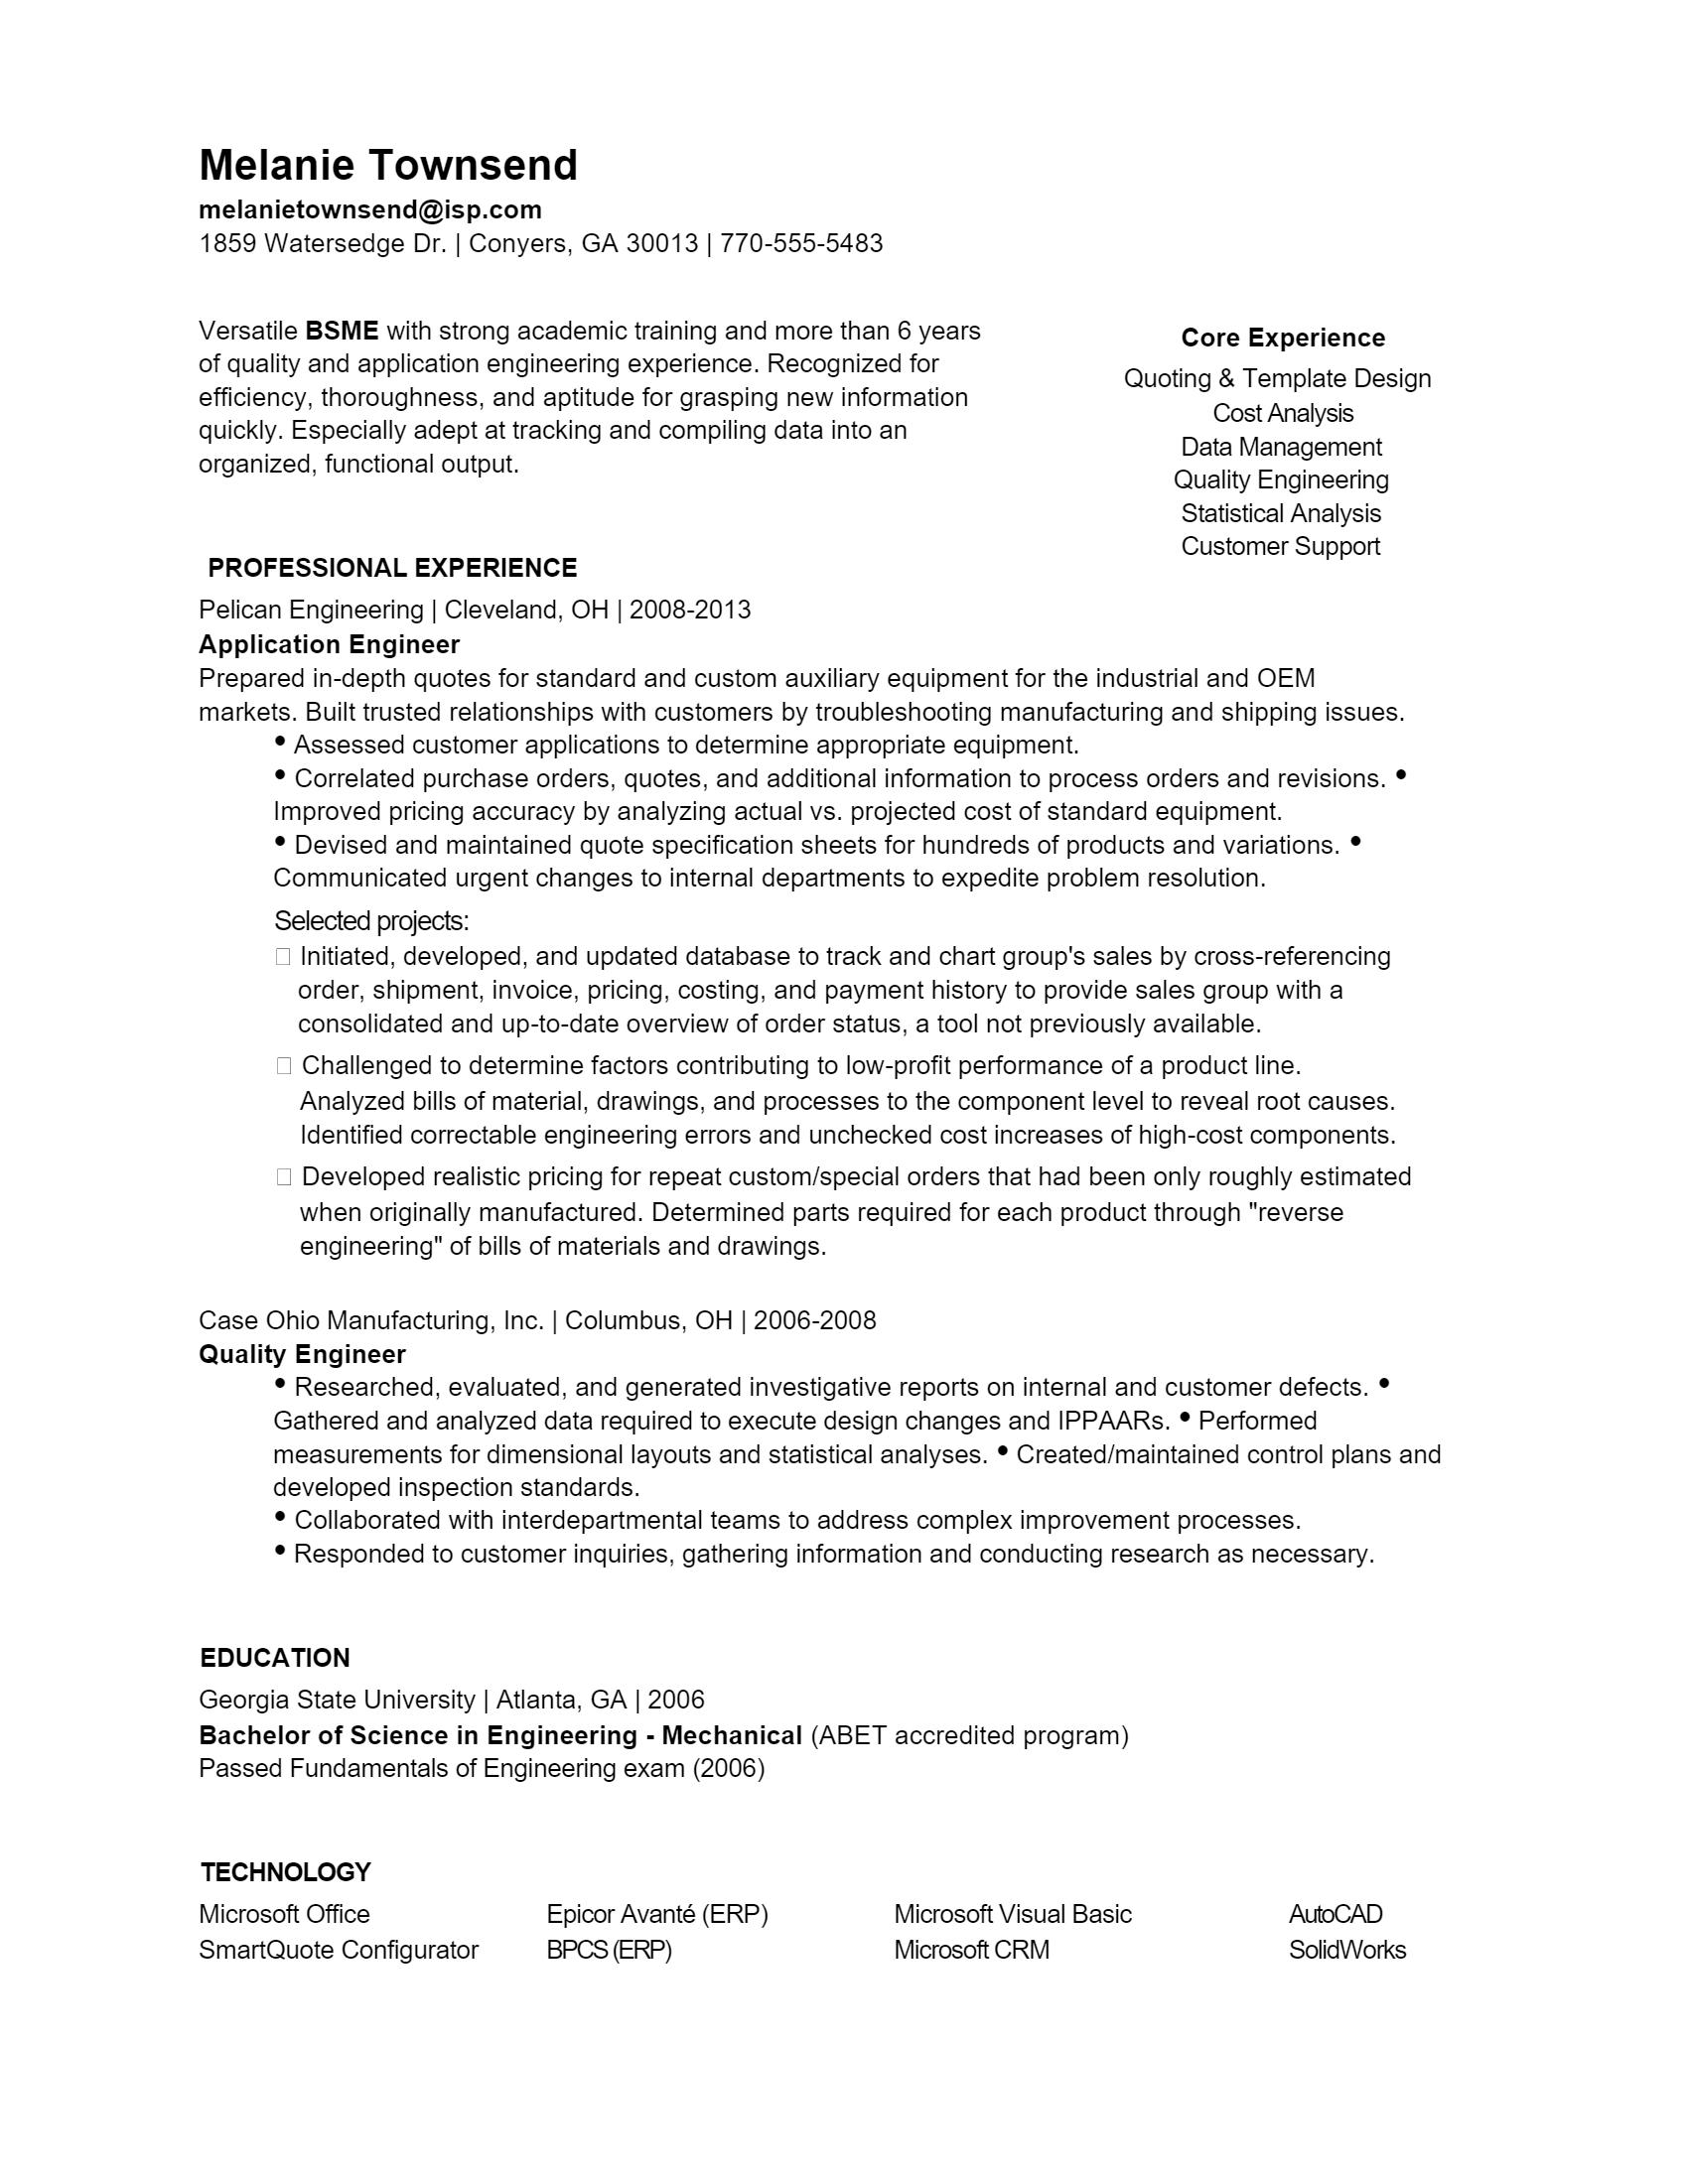 Mechanical Engineer Resume > Mechanical Engineer Resume .Docx (Word)